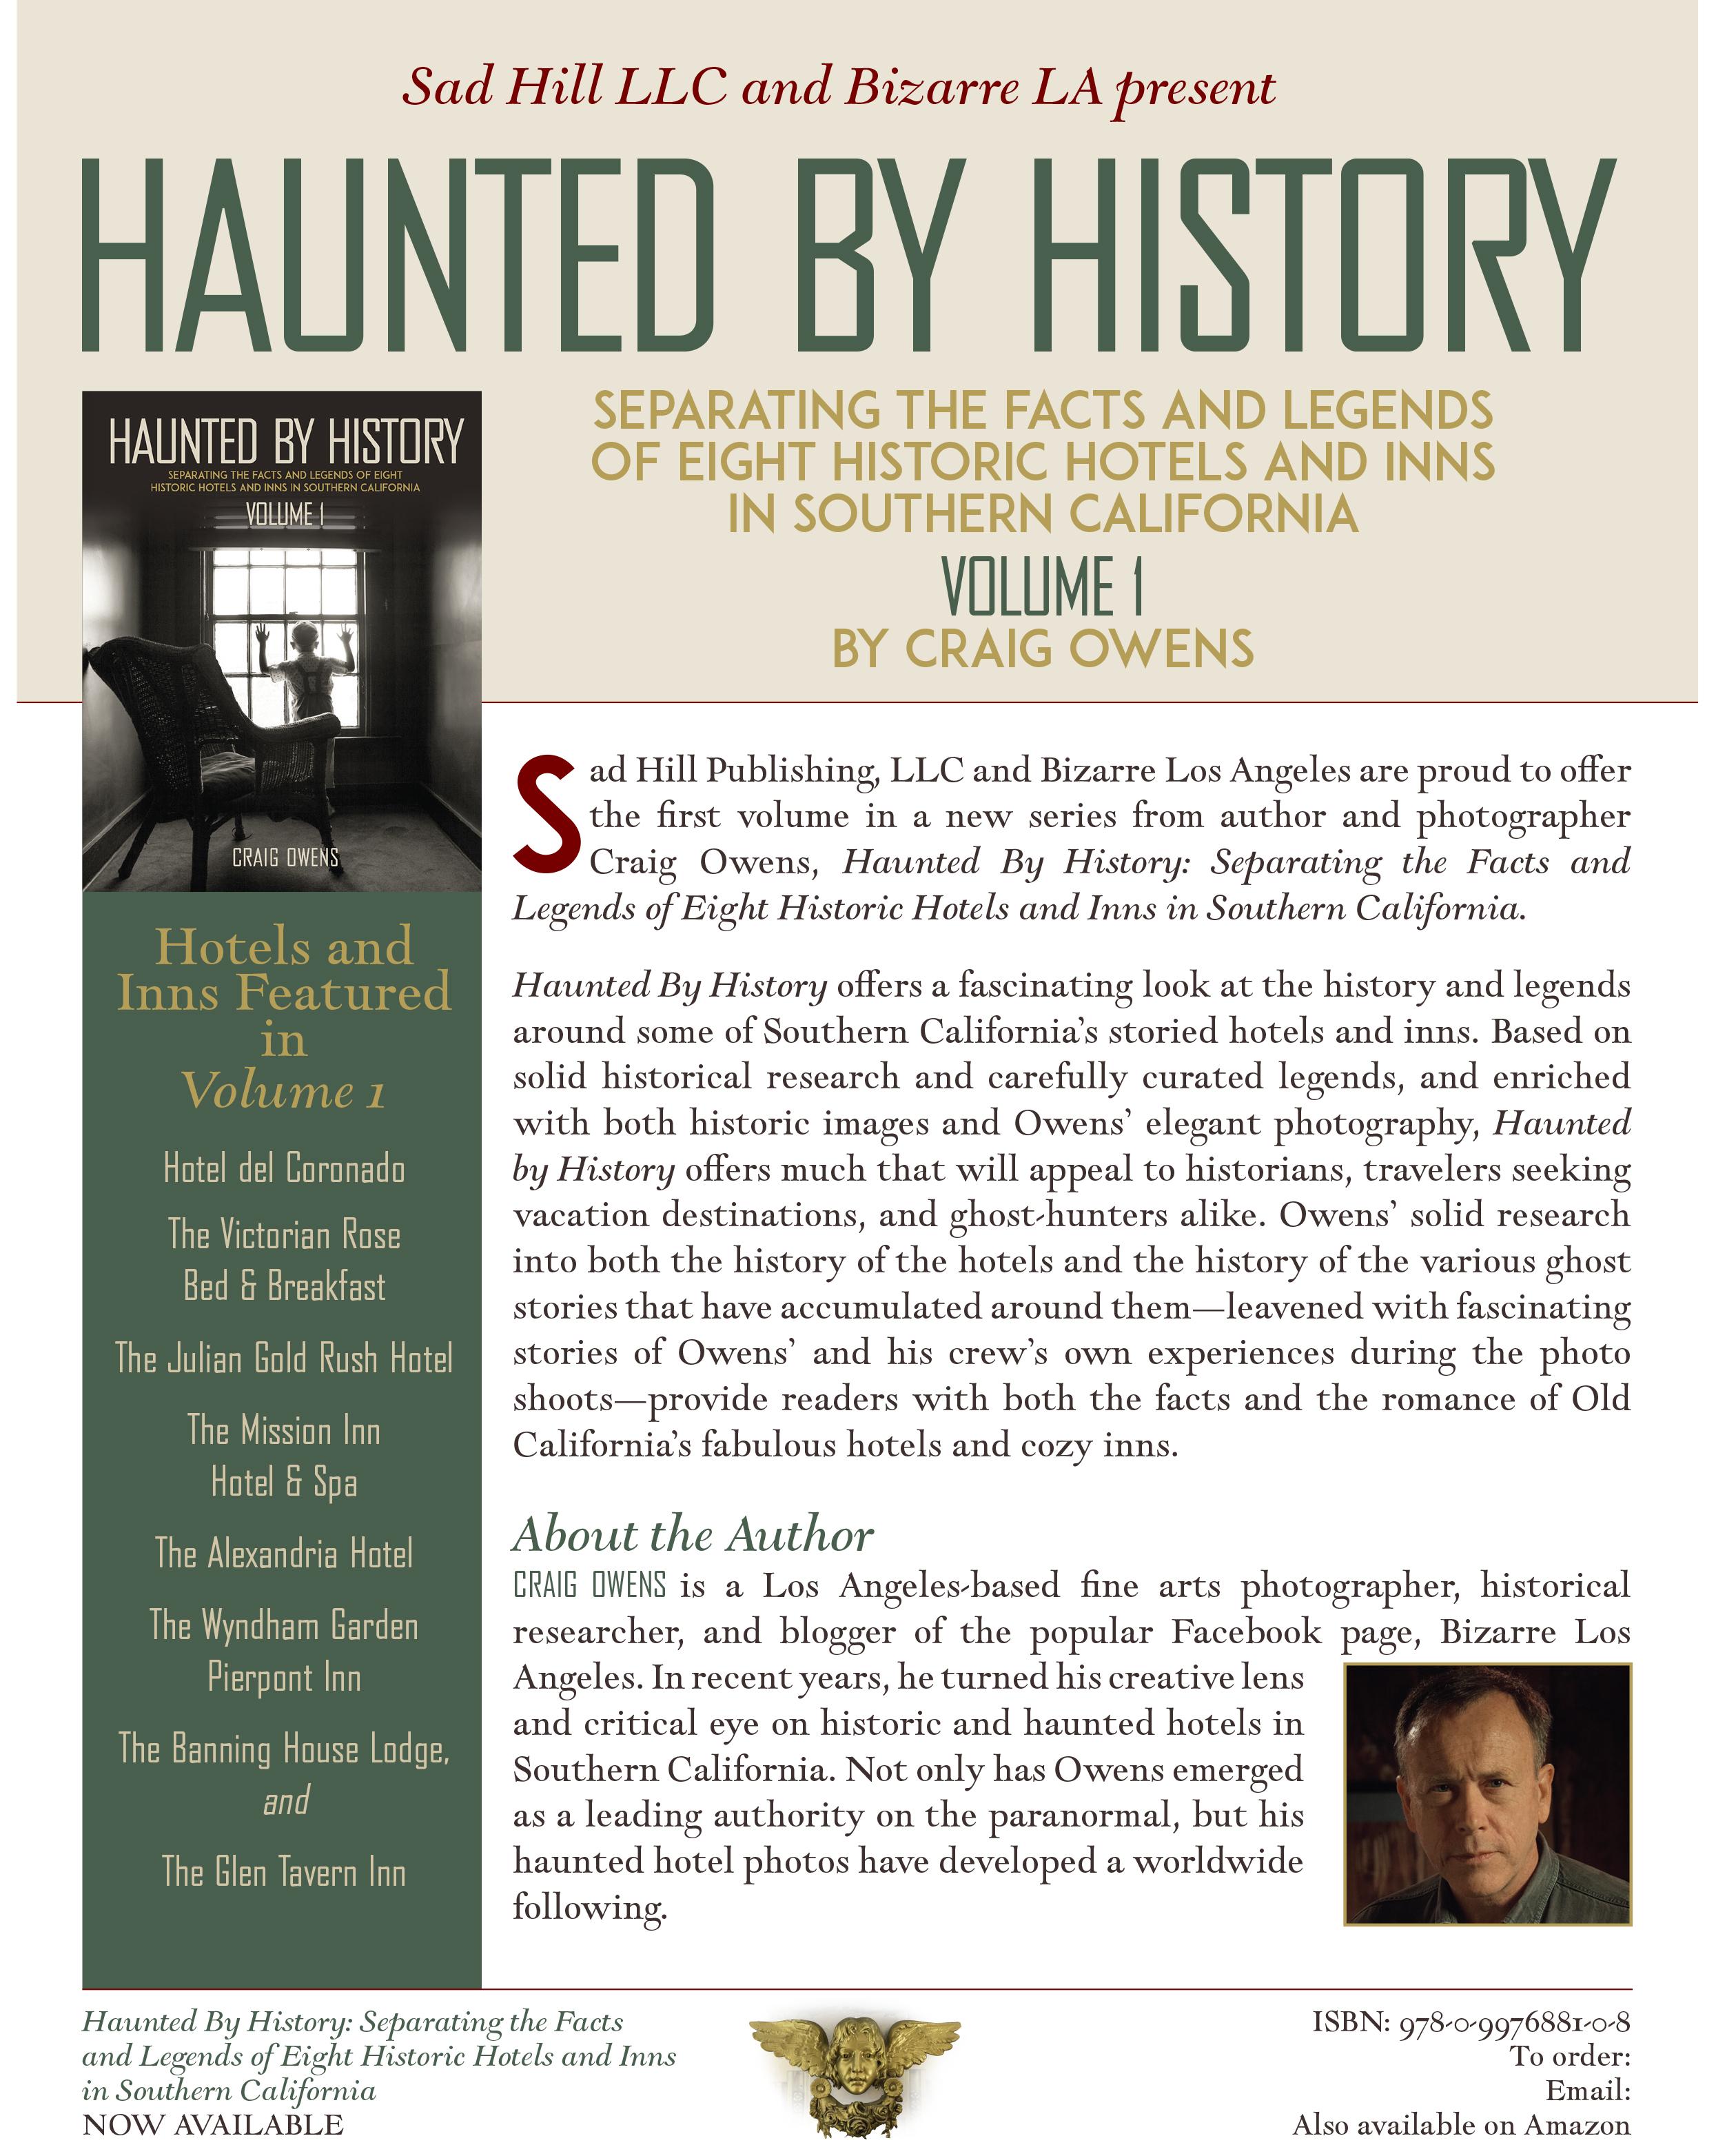 Haunted_History_Press_release_Craig_owens